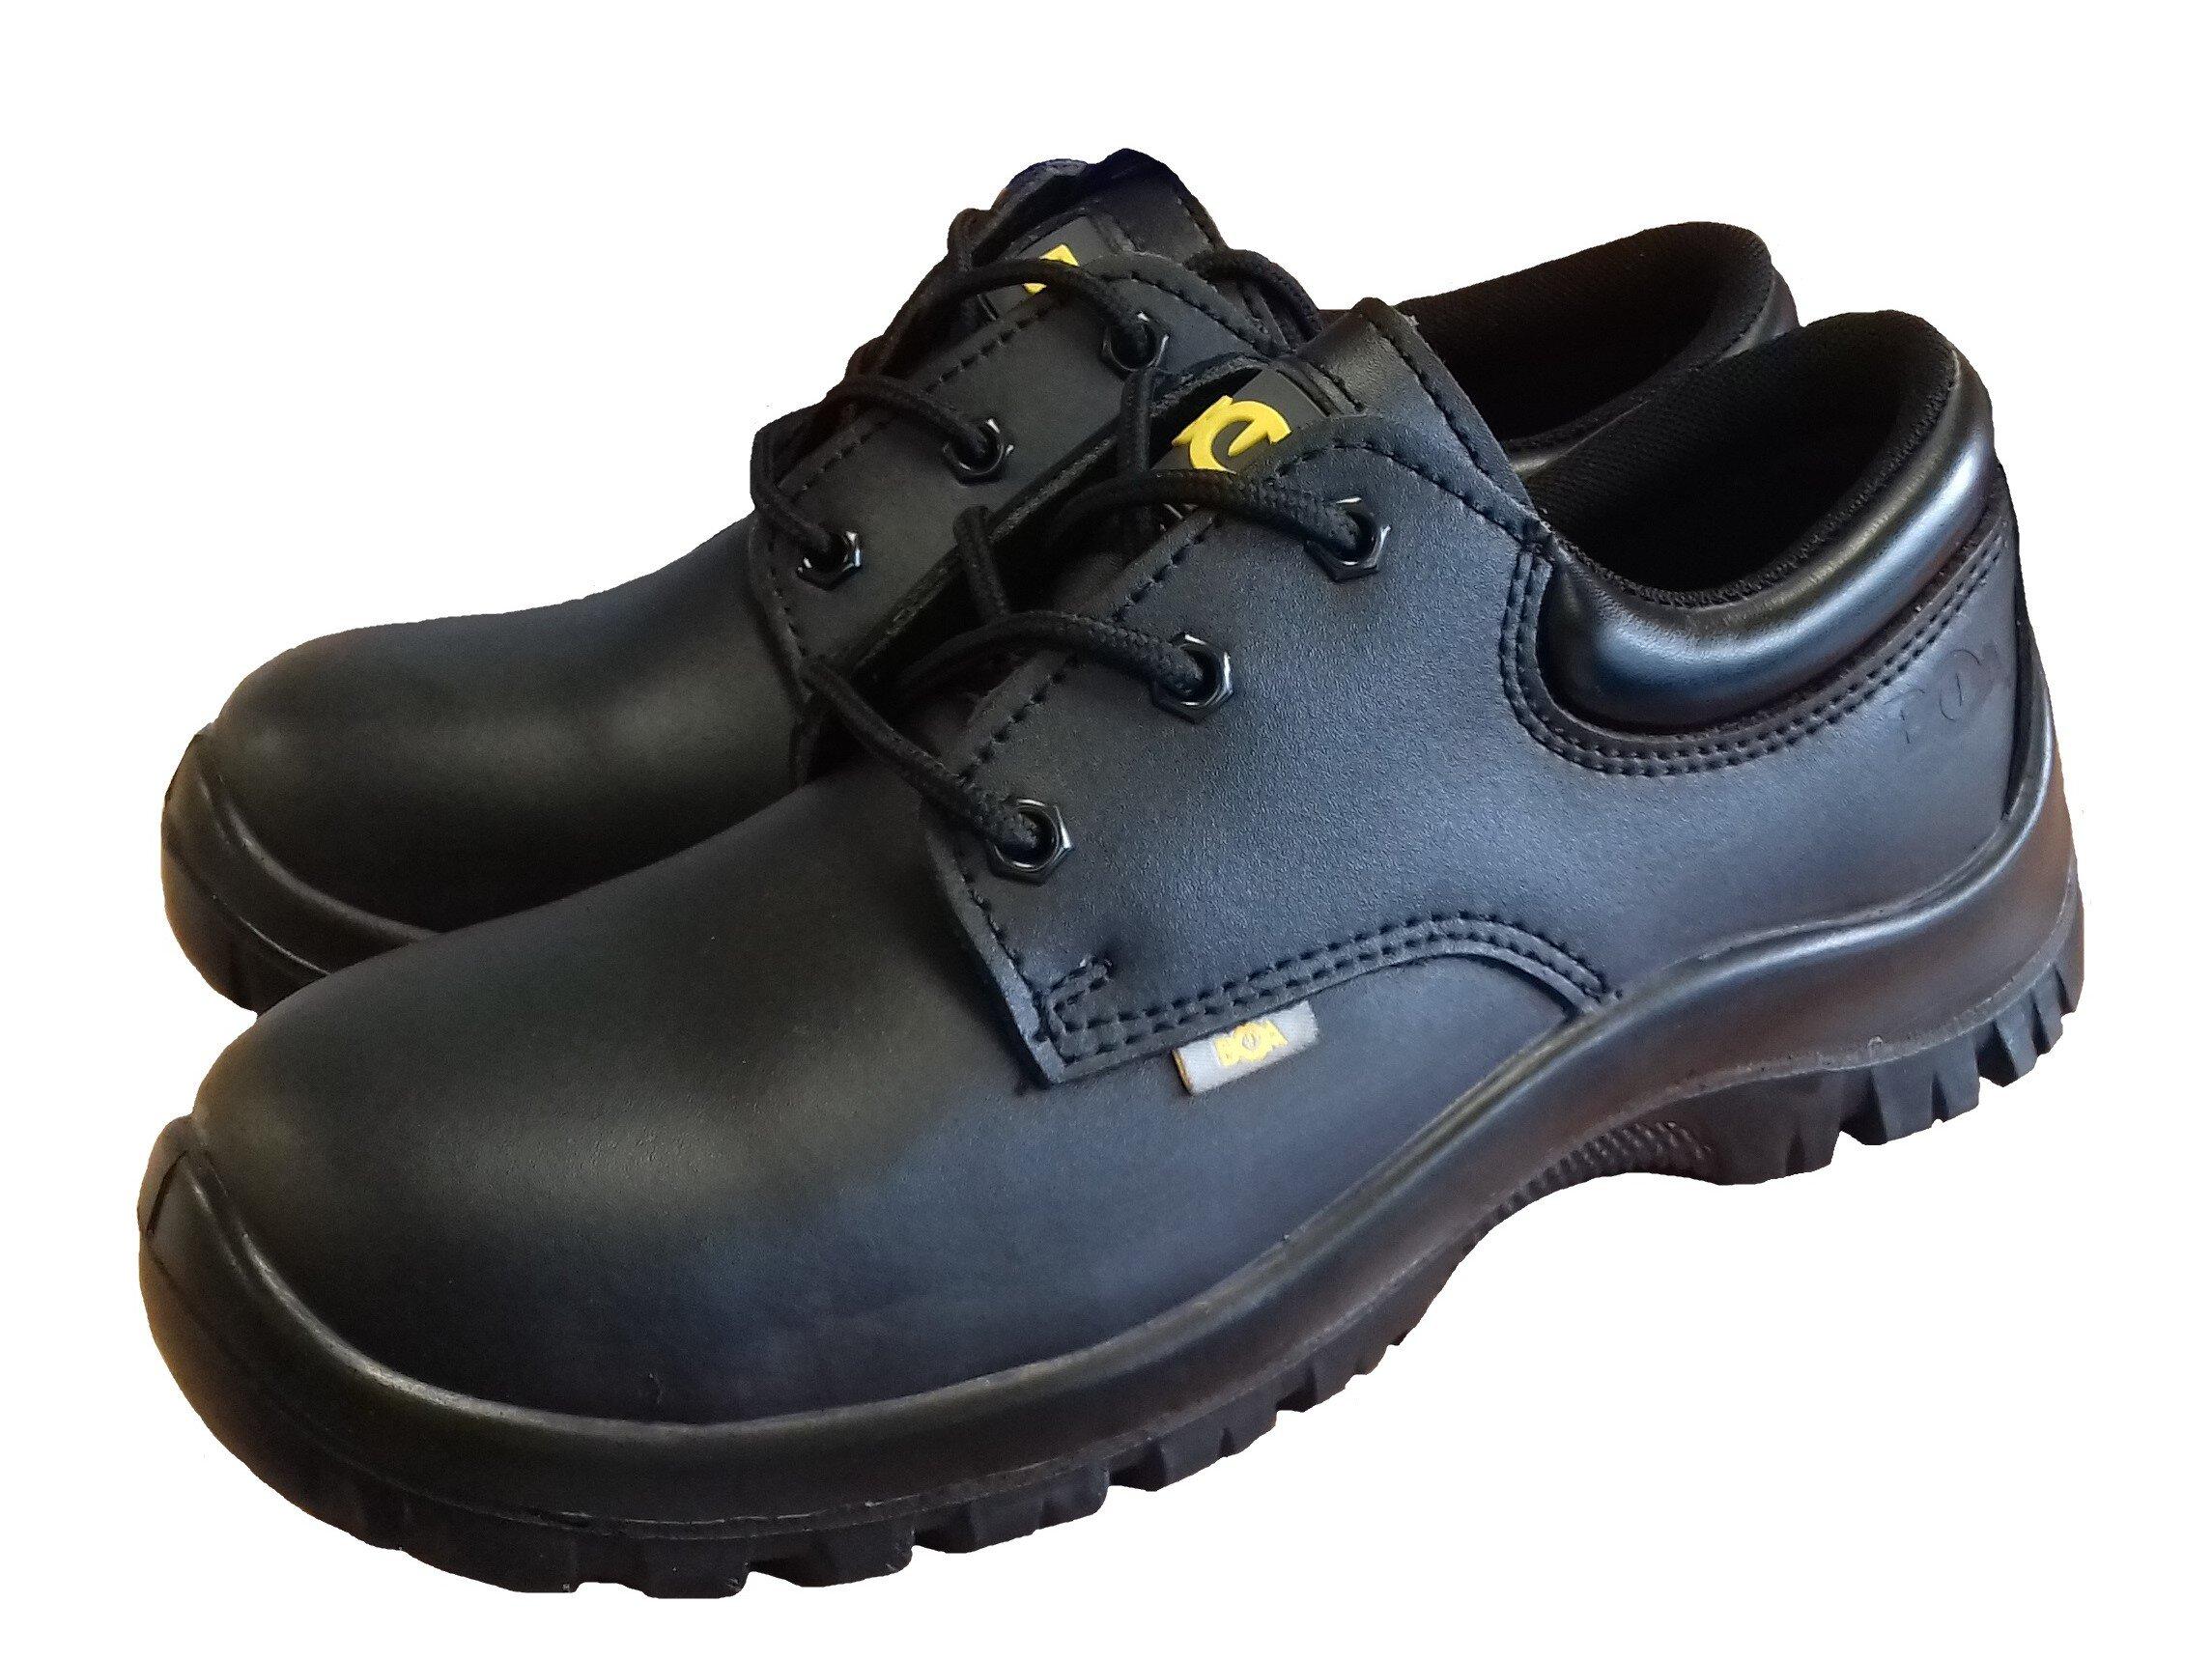 BOA Apollo Safety Shoes S3 SRC